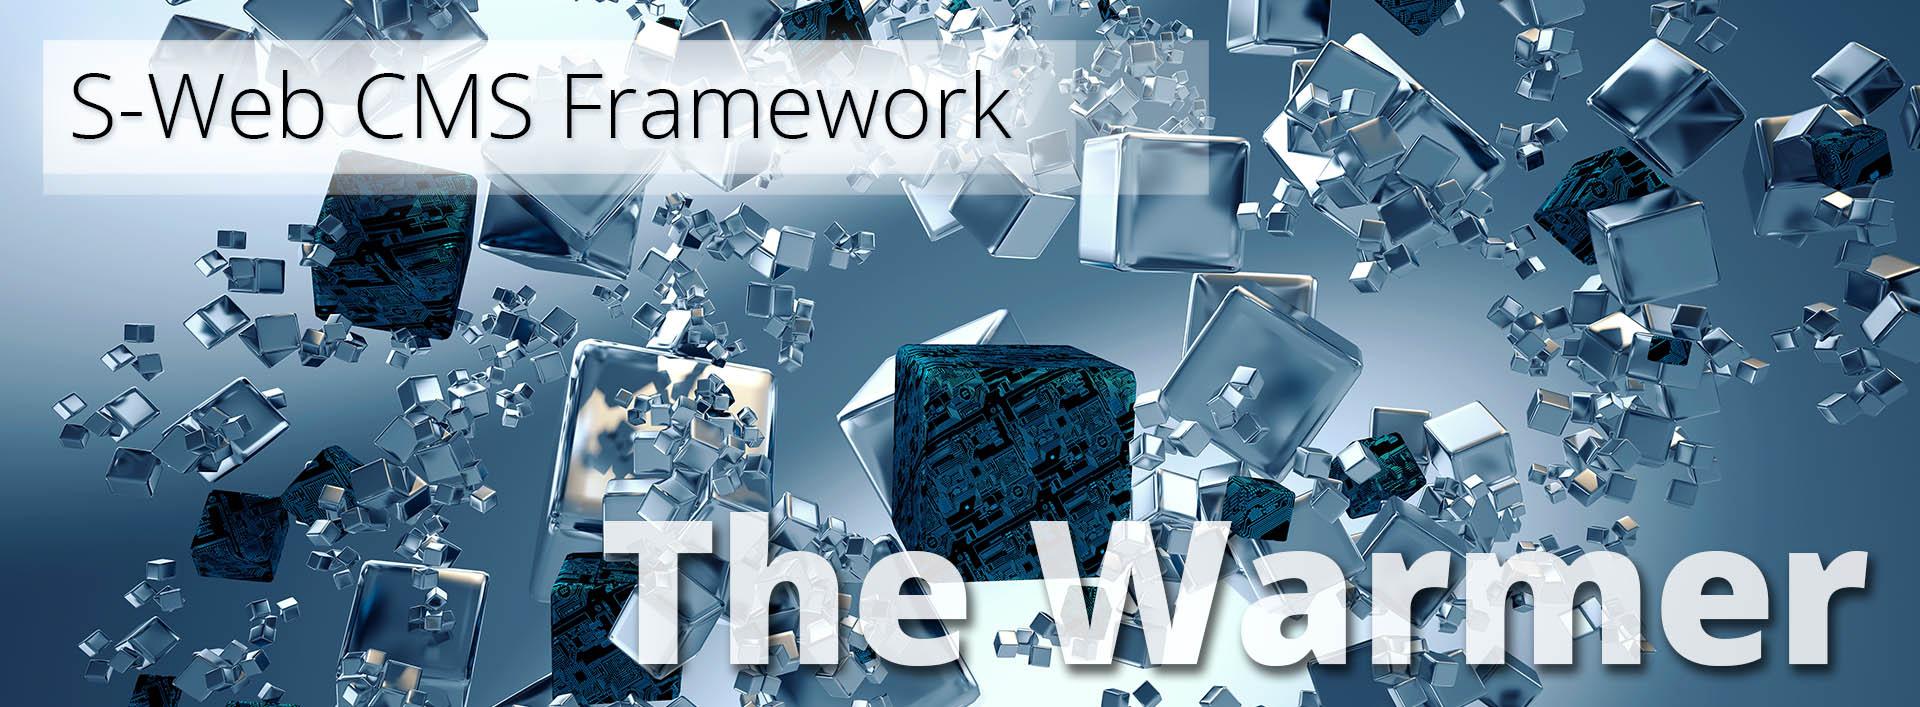 S-Web CMS Framework